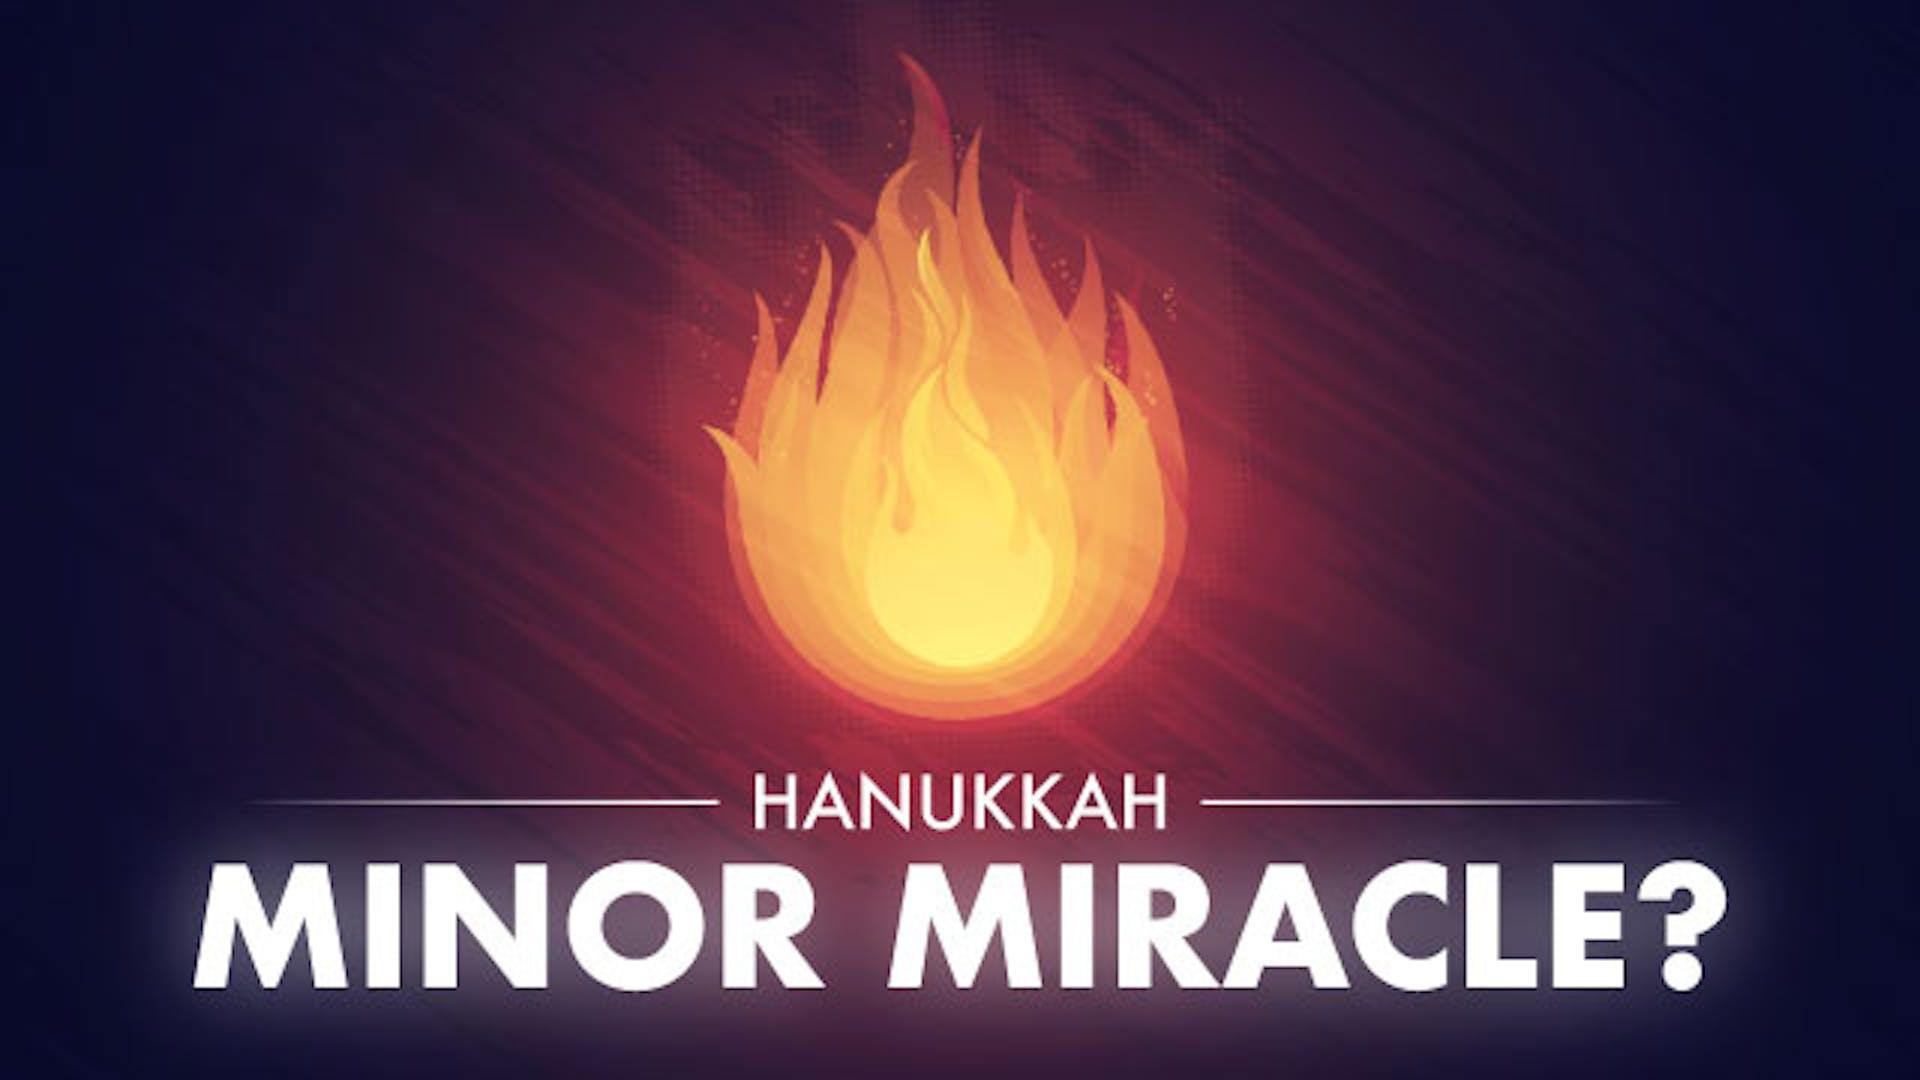 Why celebrate Hanukkah miracle